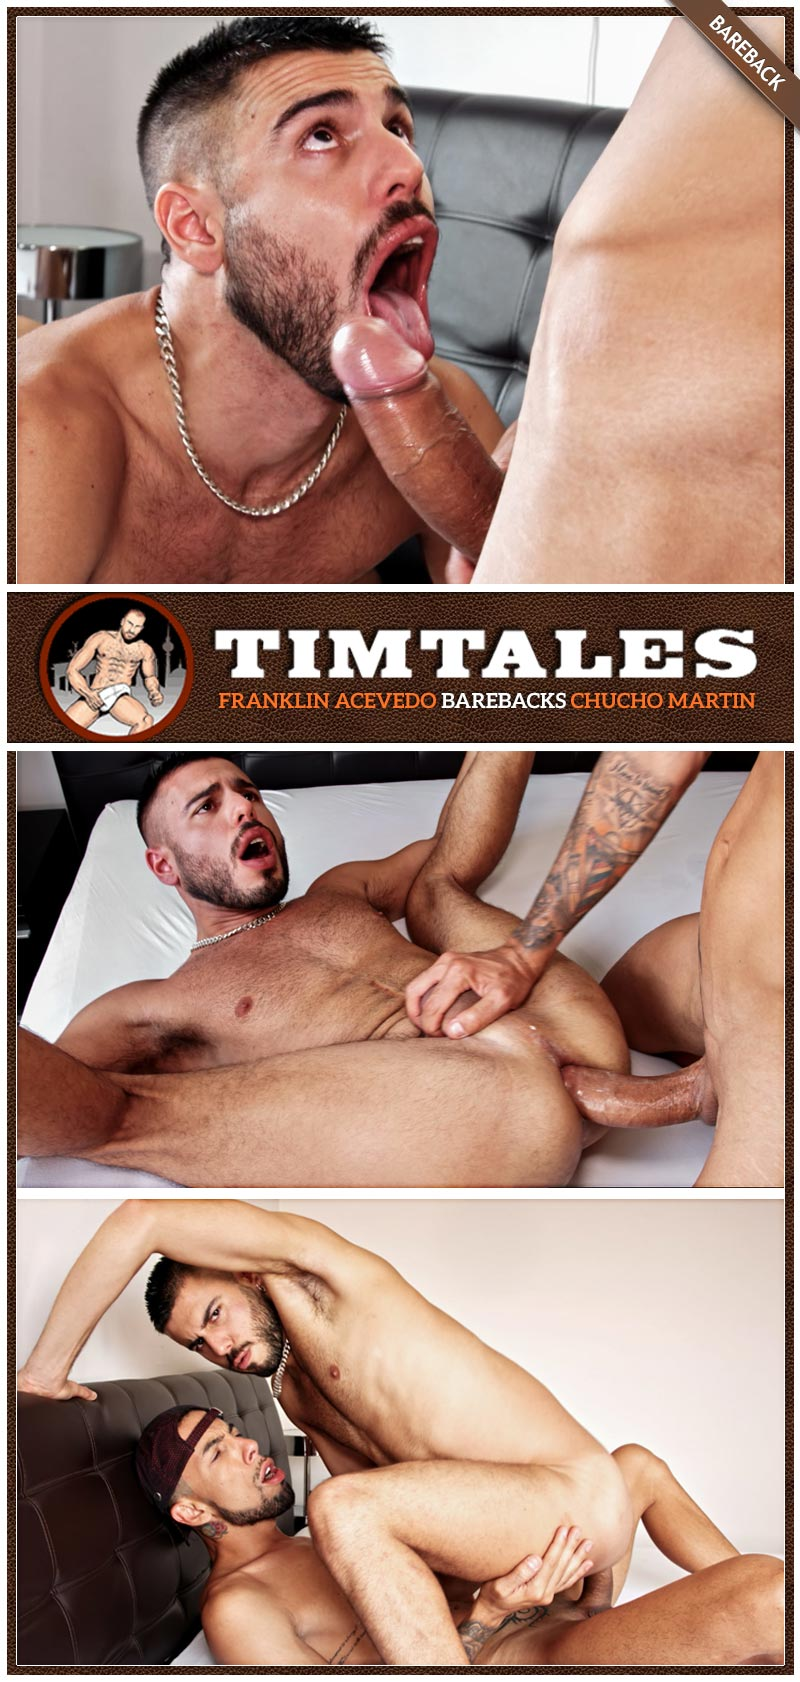 Franklin Acevedo Fucks Chucho Martin (Bareback) at TimTales